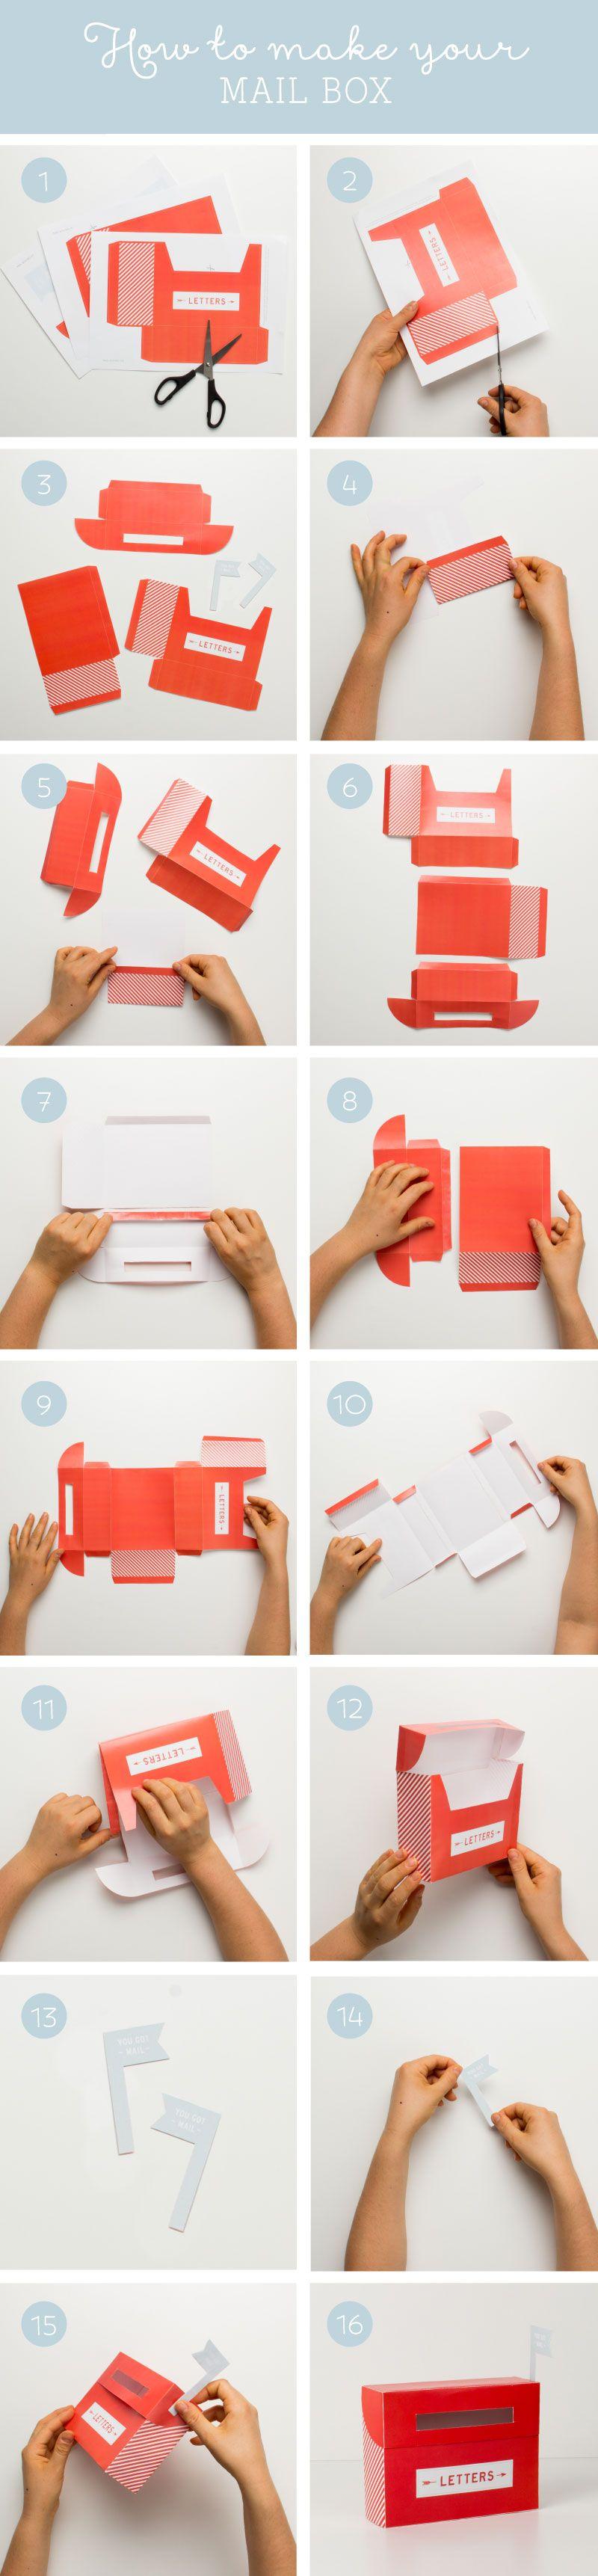 Free Mail Box Printables Tinyme Blog Paper Box Diy Diy Gifts Paper Paper Box Tutorial